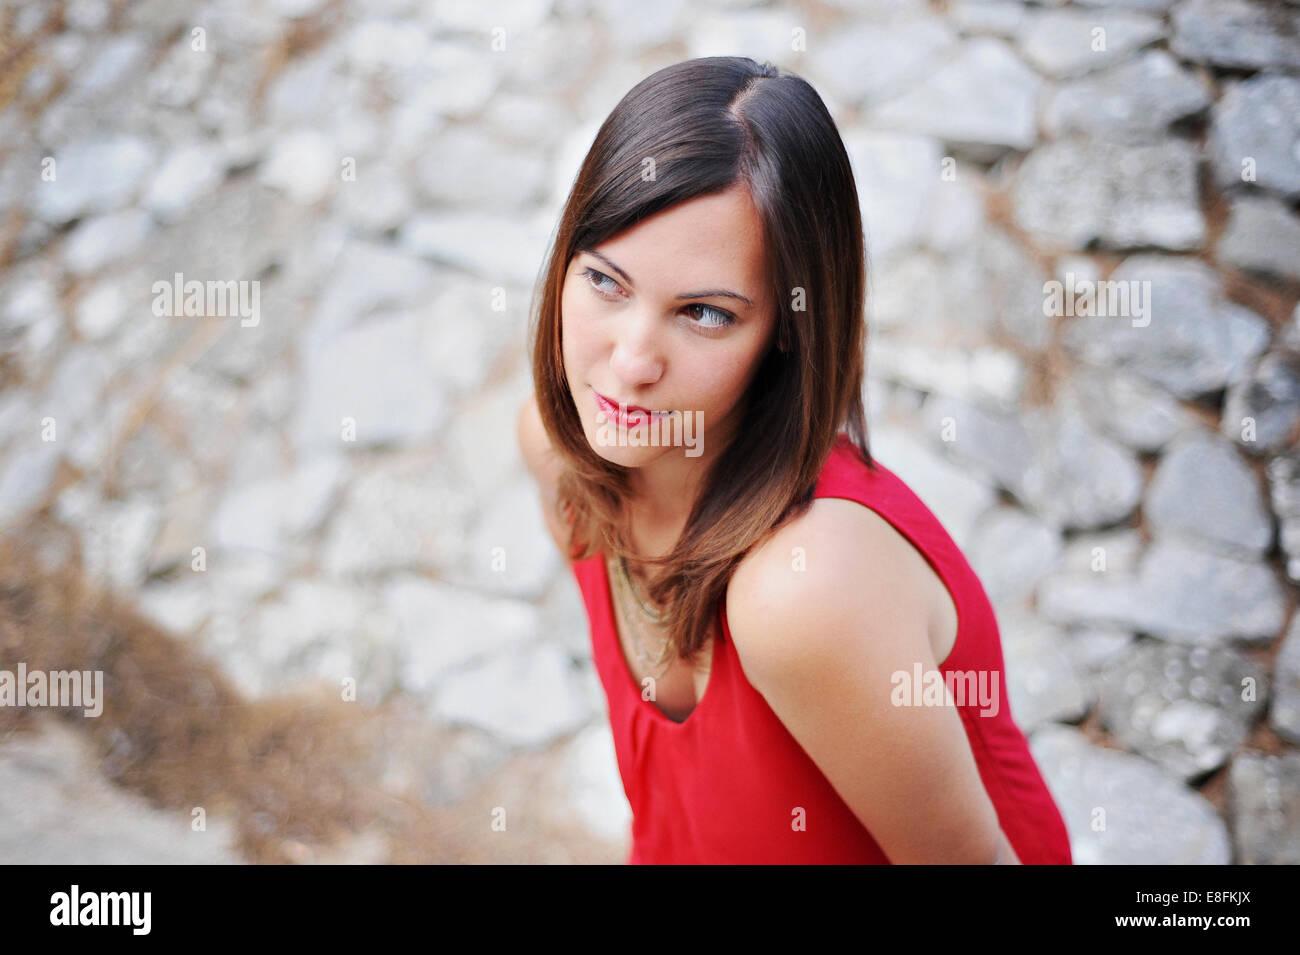 Provence, Francia hermosa morenita chica vestida de rojo Imagen De Stock